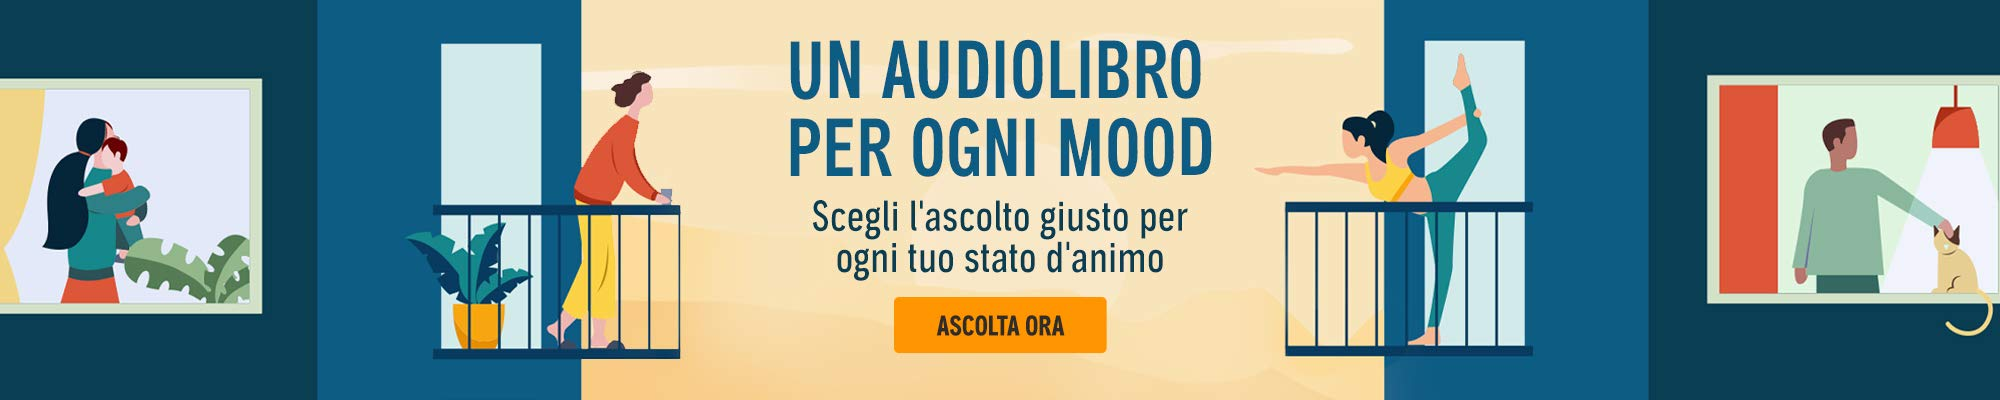 Un Audiolibro per ogni mood